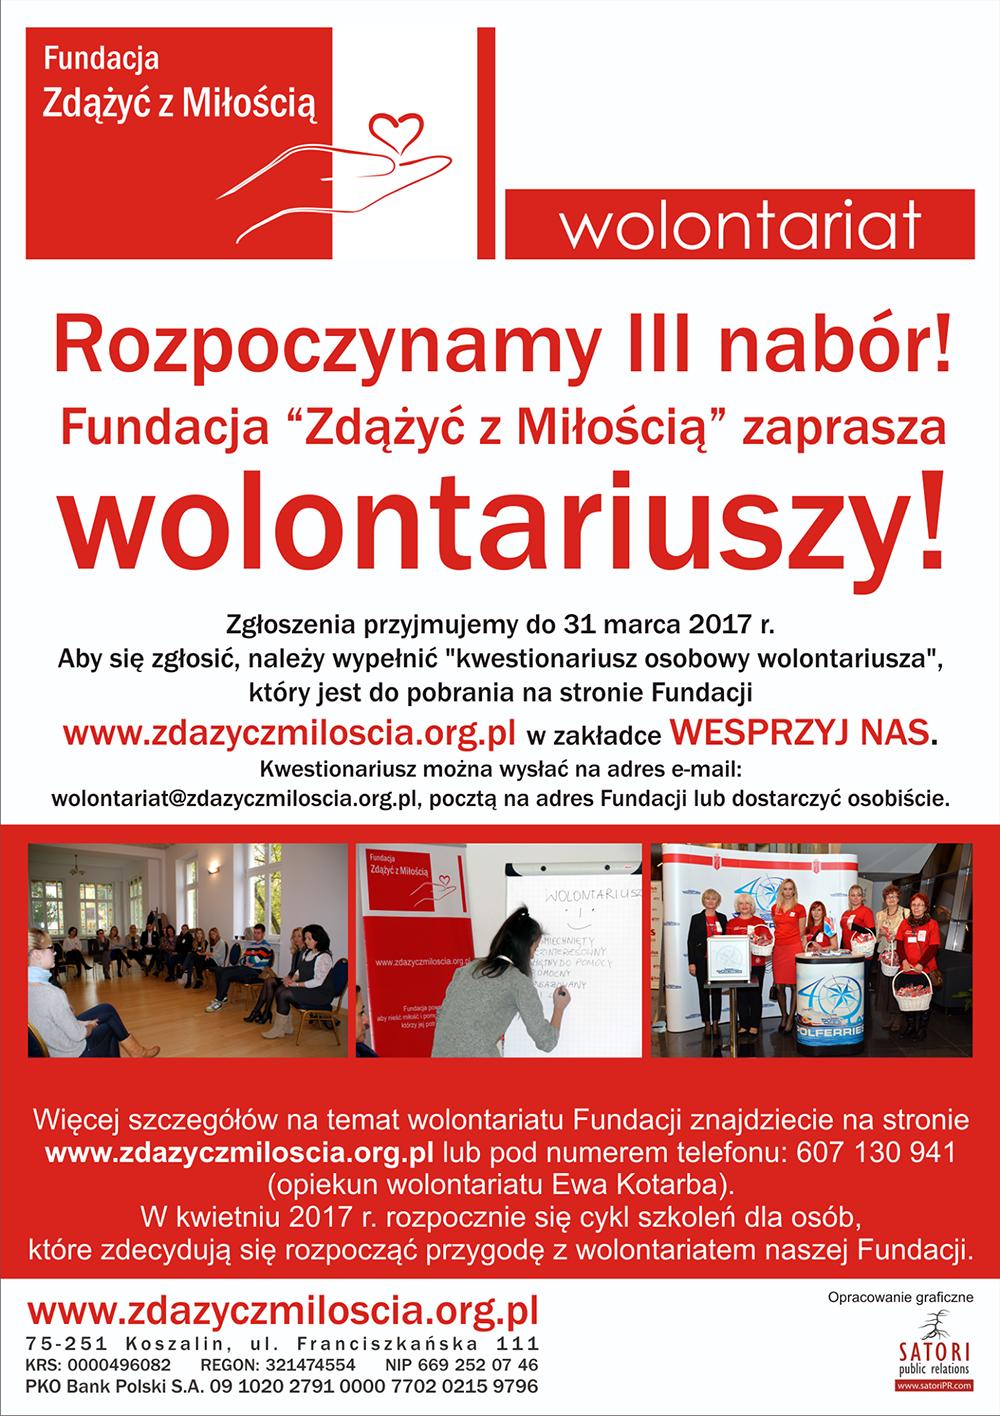 wolontariat III